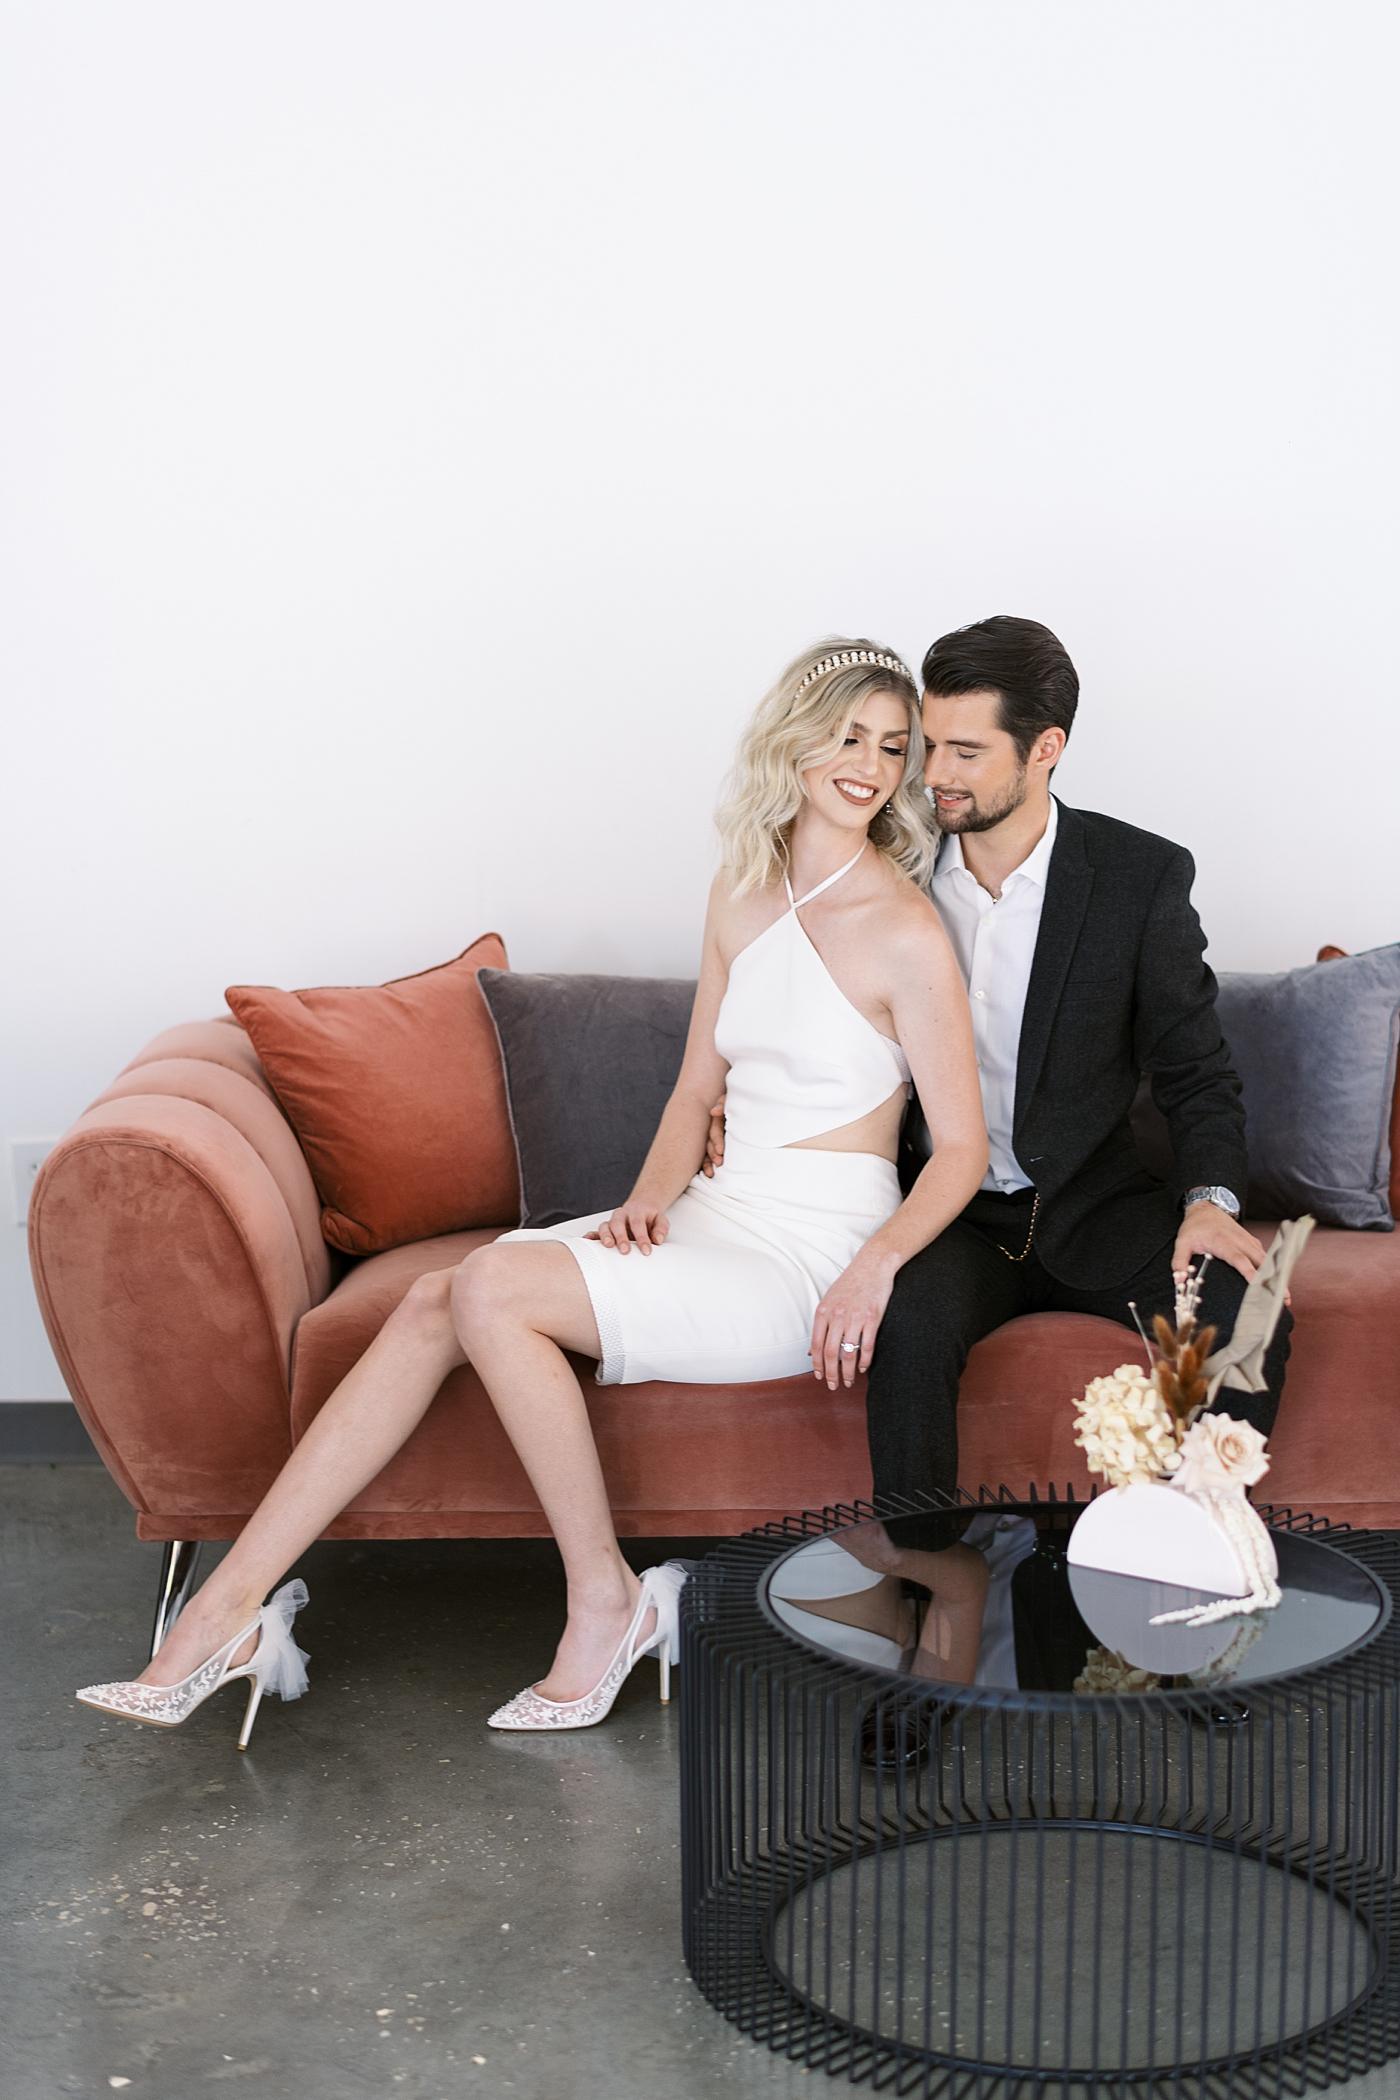 Orlando elopement